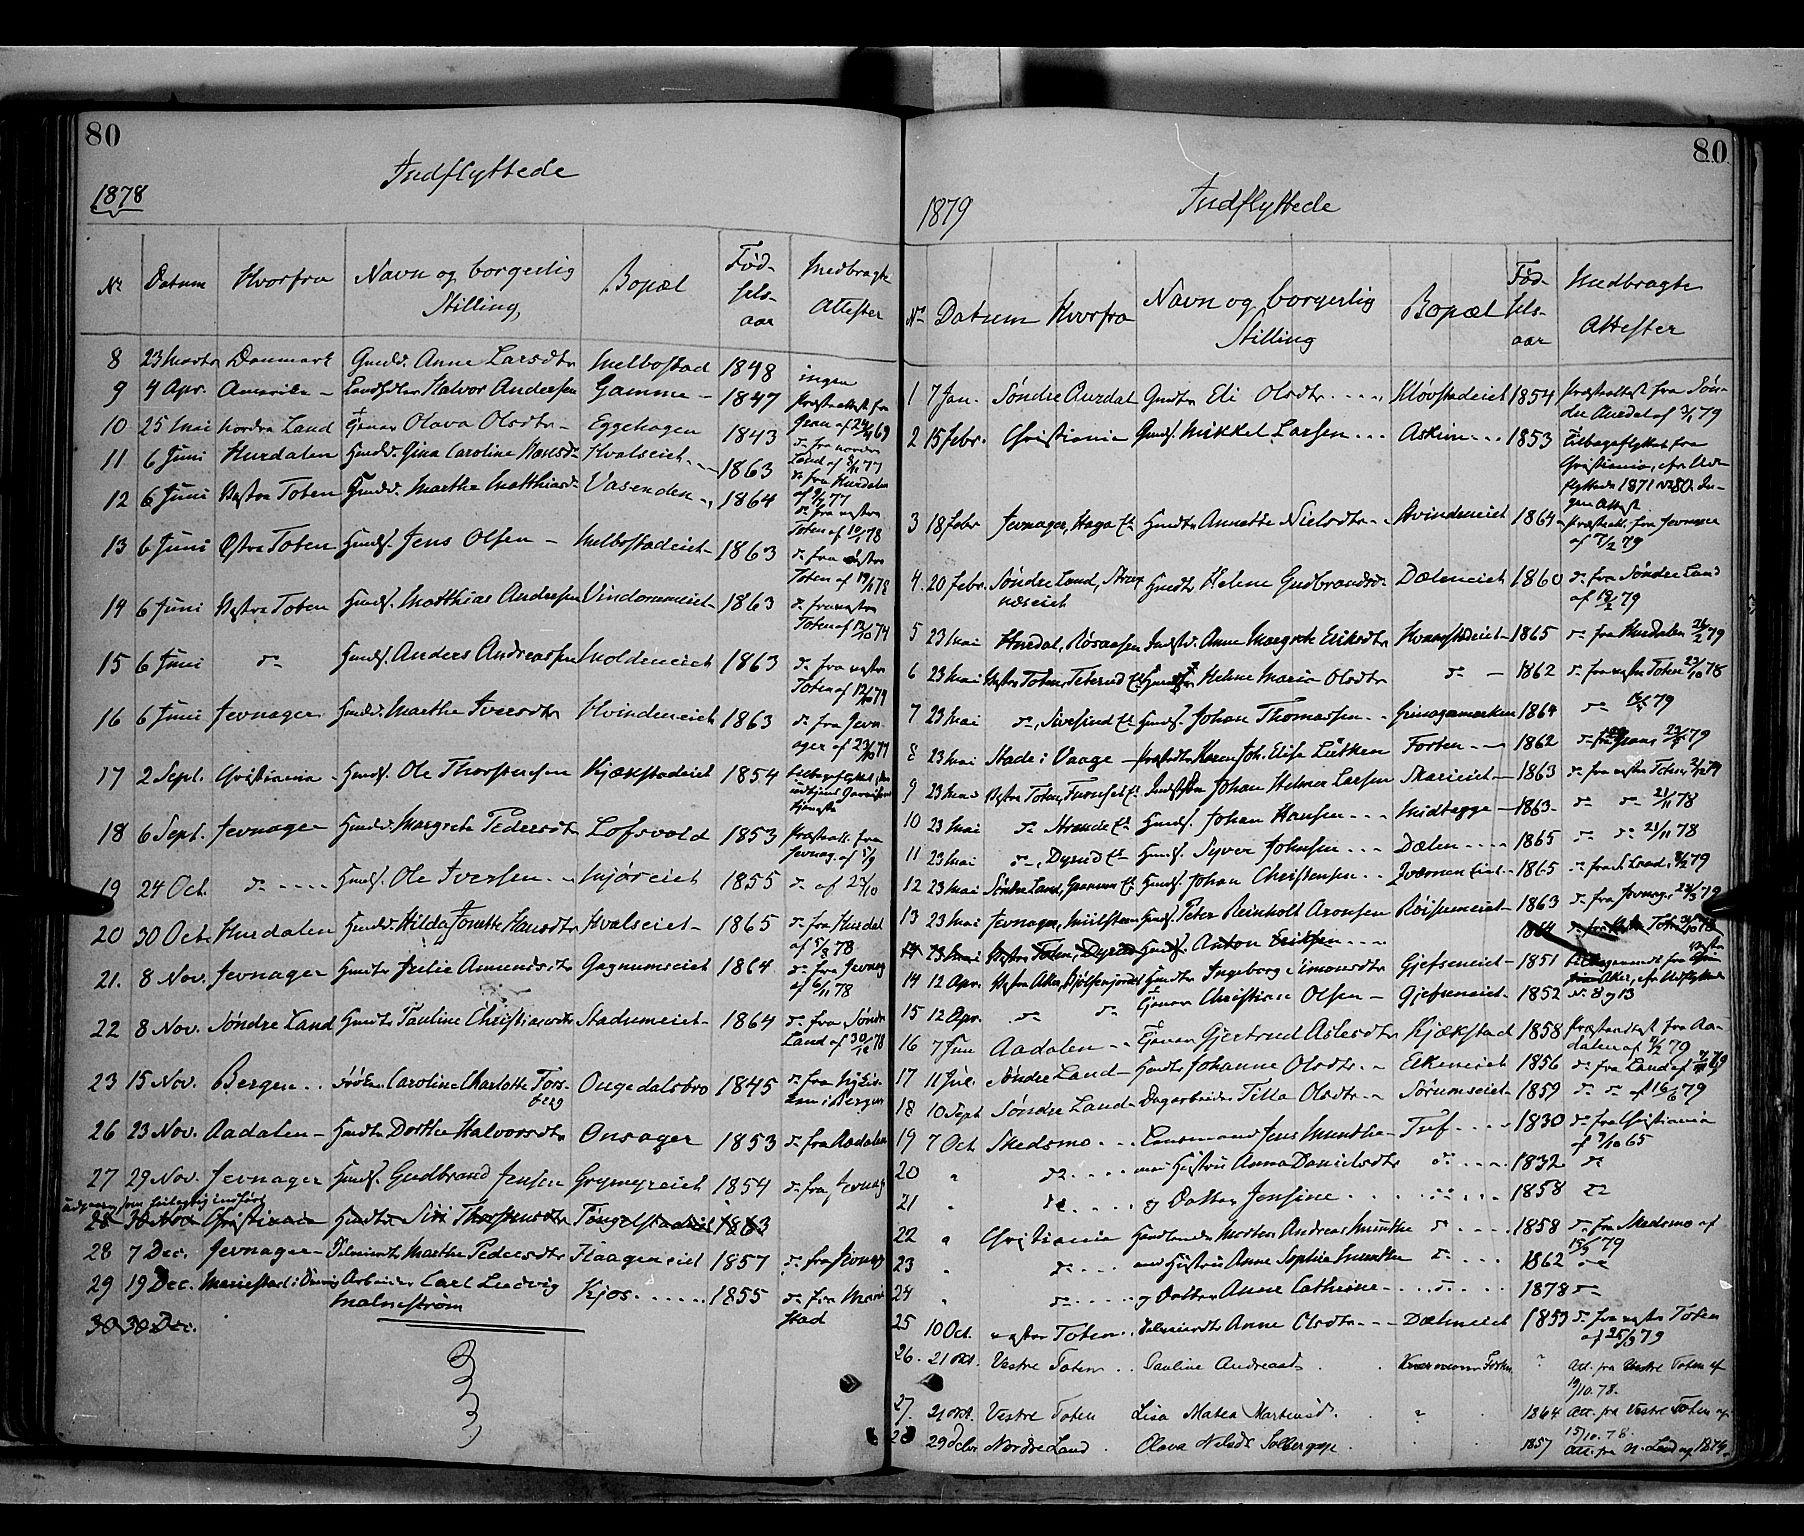 SAH, Gran prestekontor, Ministerialbok nr. 13, 1875-1879, s. 80